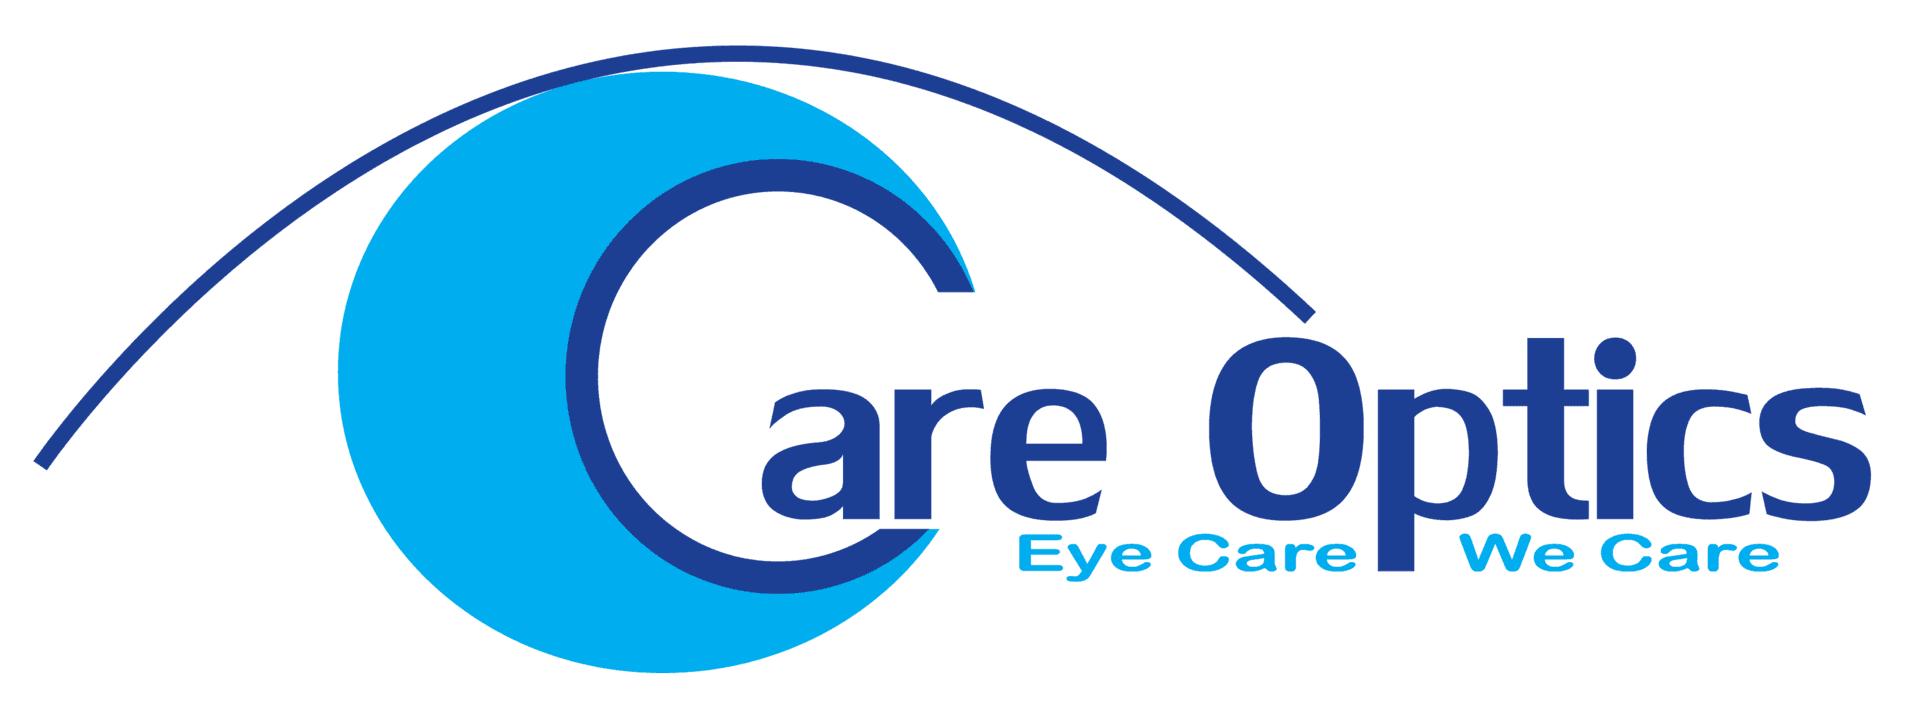 Care Optics logo